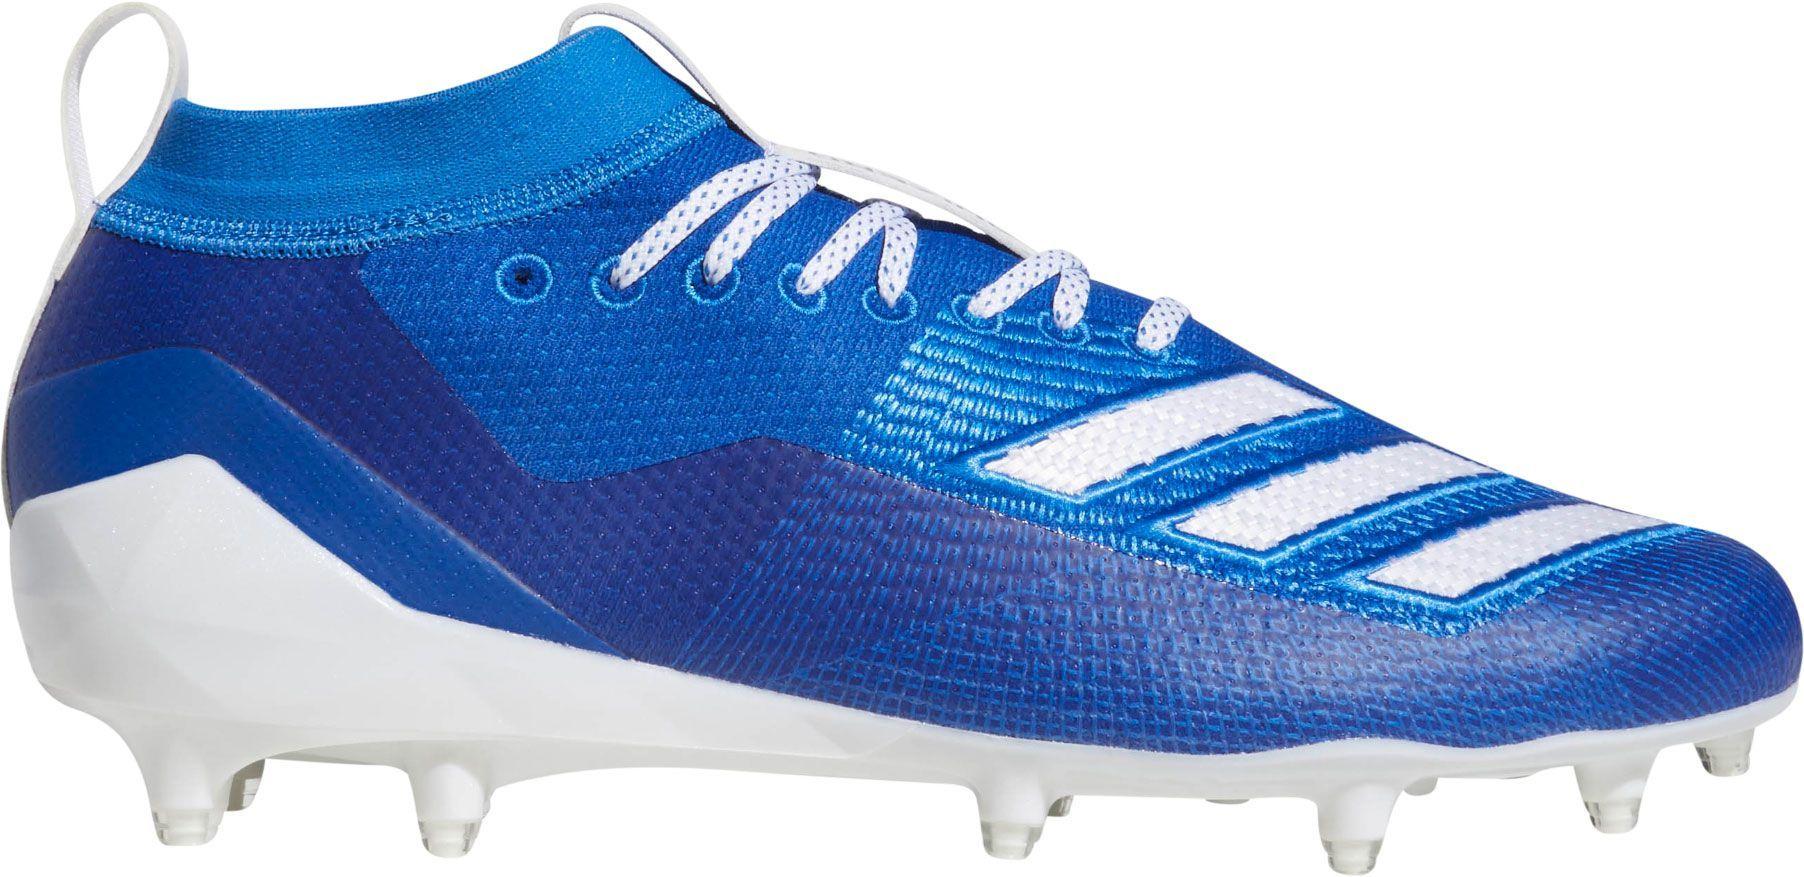 Adidas men, Football cleats, Adidas